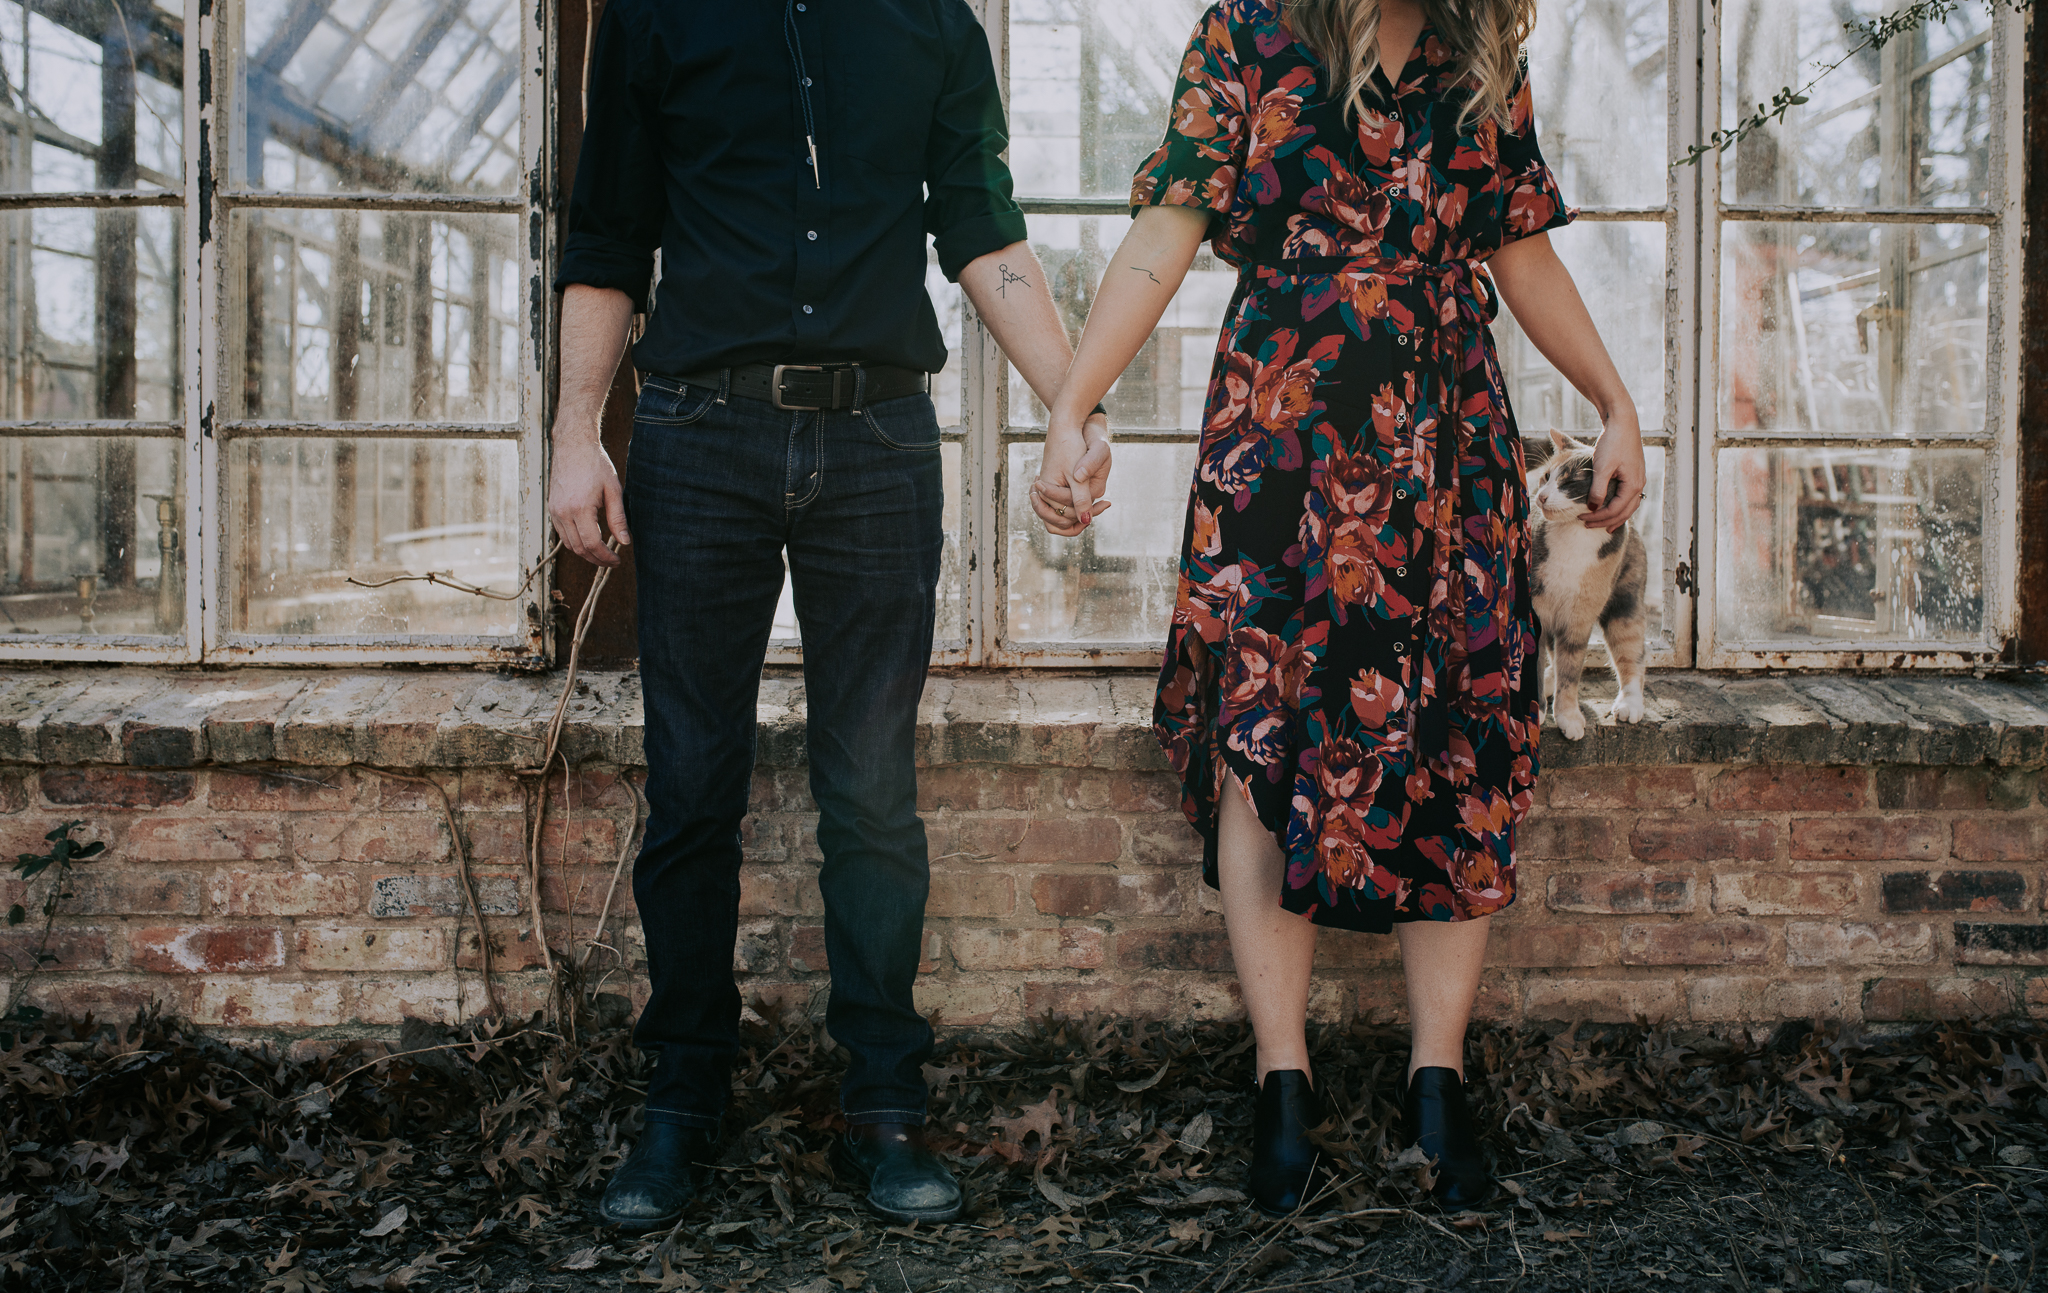 kristen giles photography   texas-wedding-elopement-photographer-sekrit theater-austin-engagement-8-blog.jpg